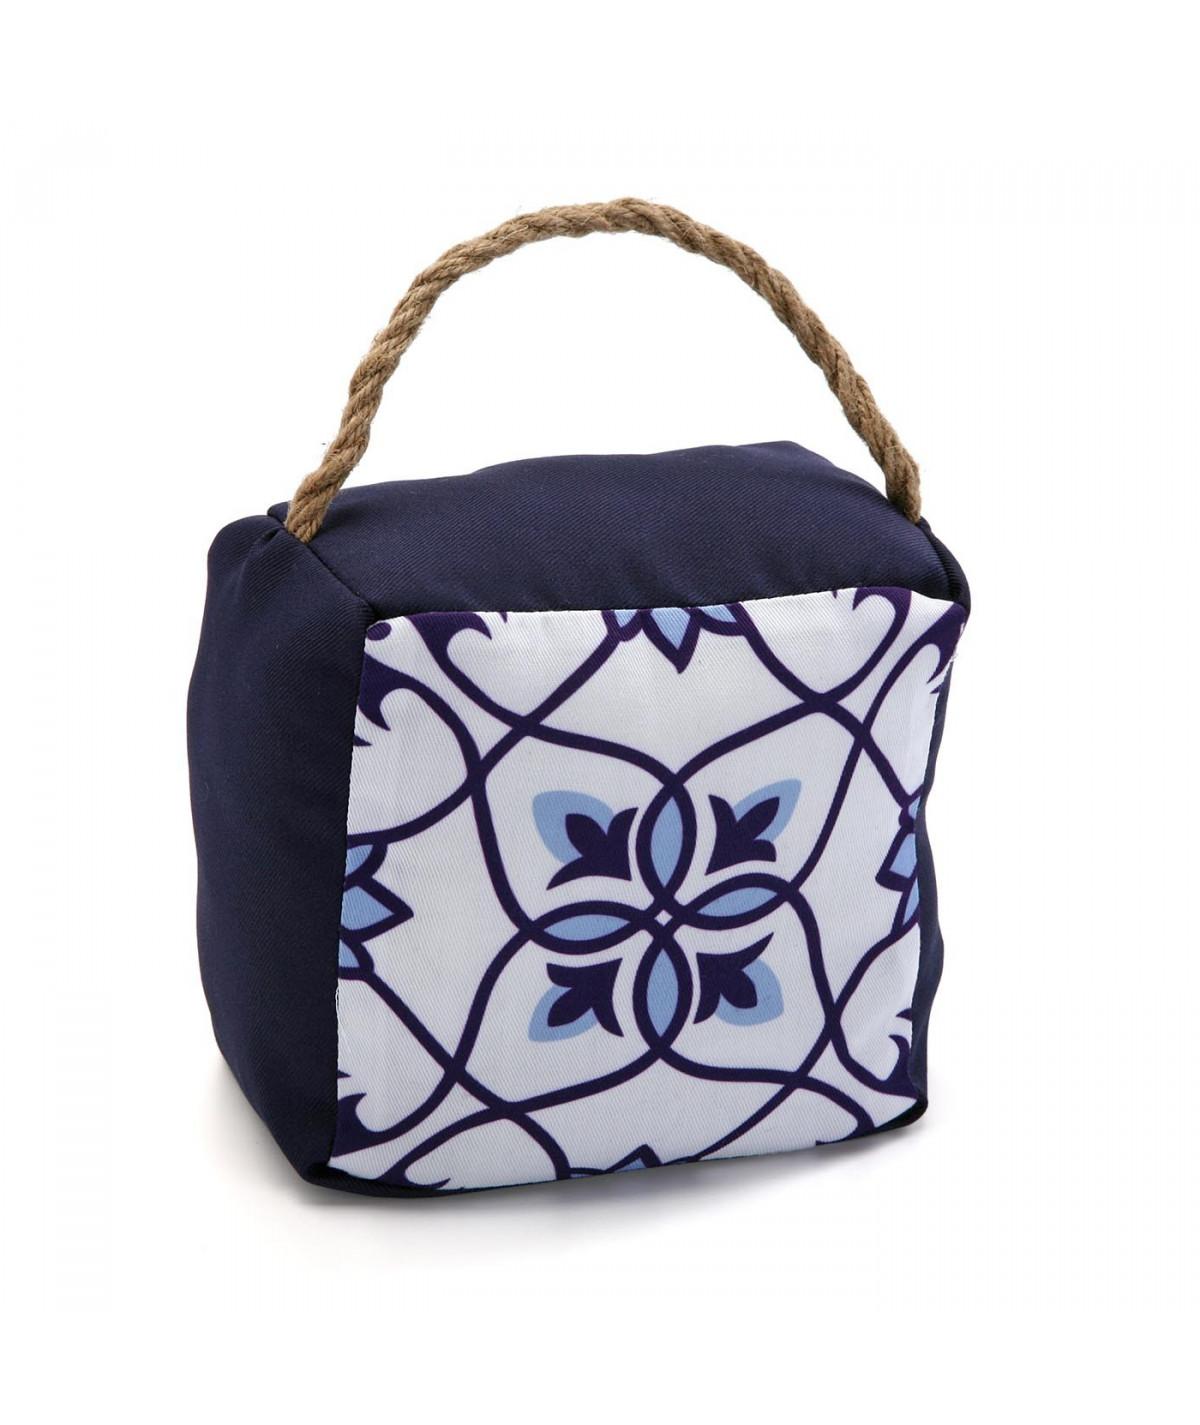 Bloc porte mosaique bleu avec anse - Aquarelle - Boudin - Bloc porte|Yesdeko